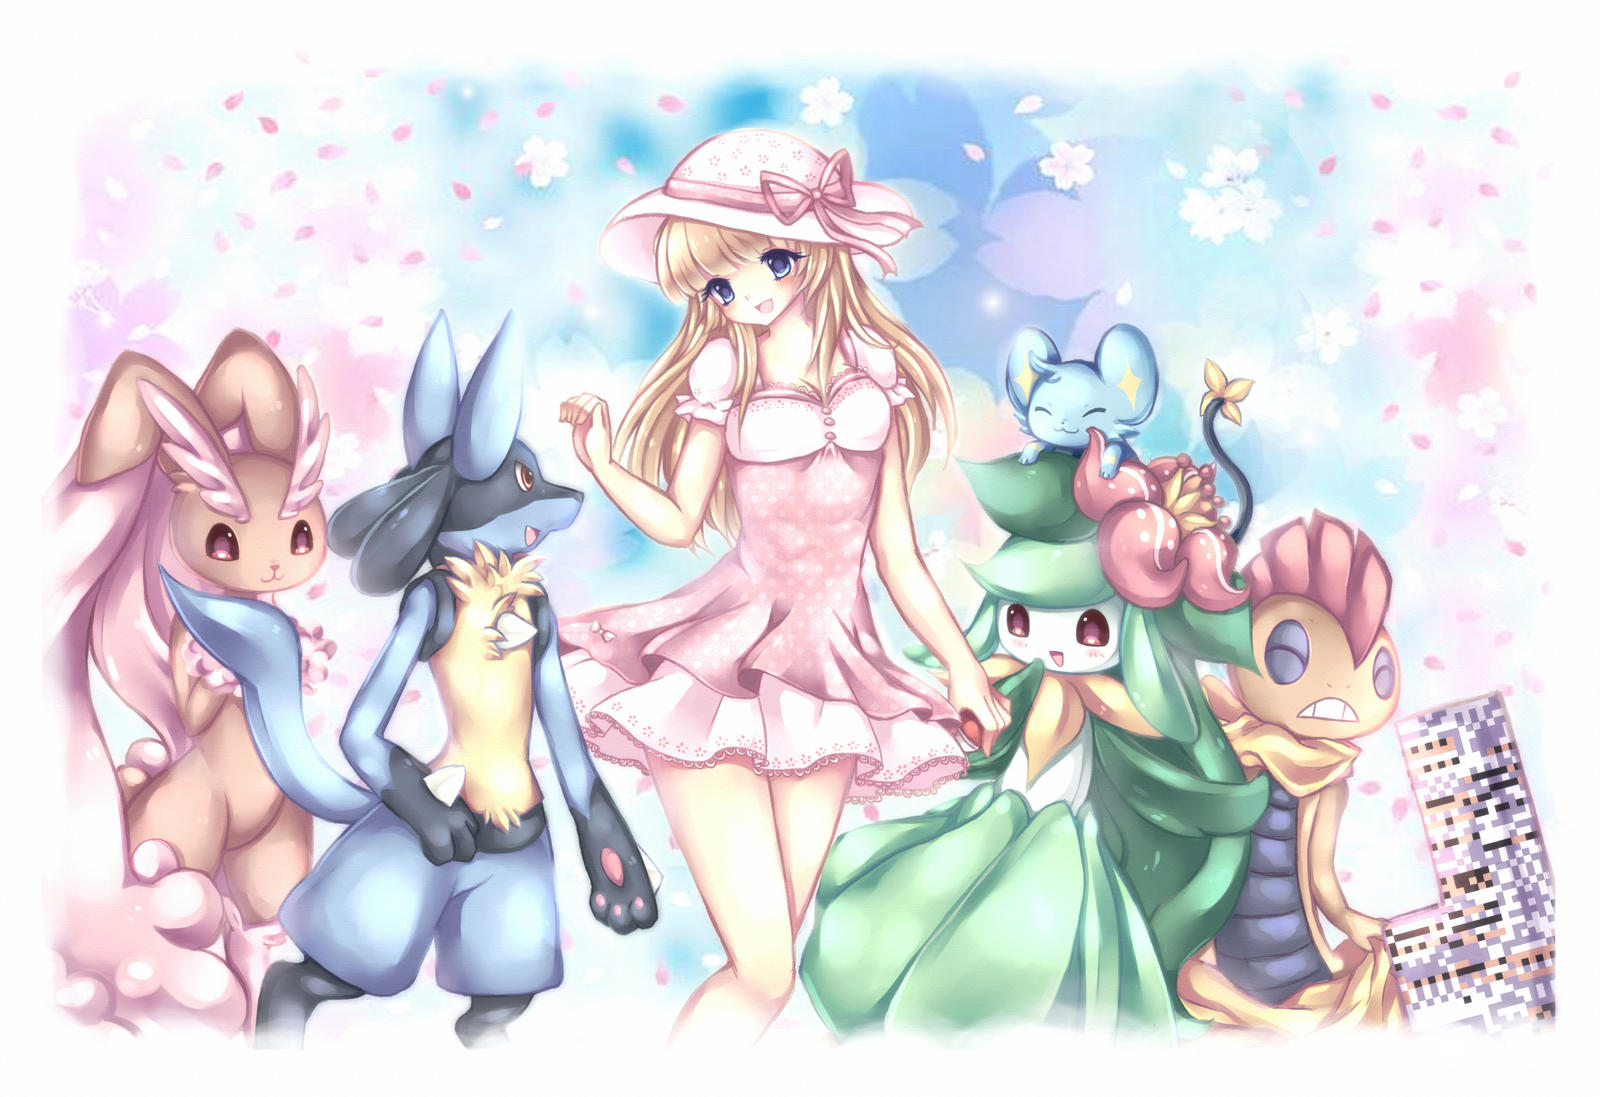 + My Pokemon Team + by Midna01